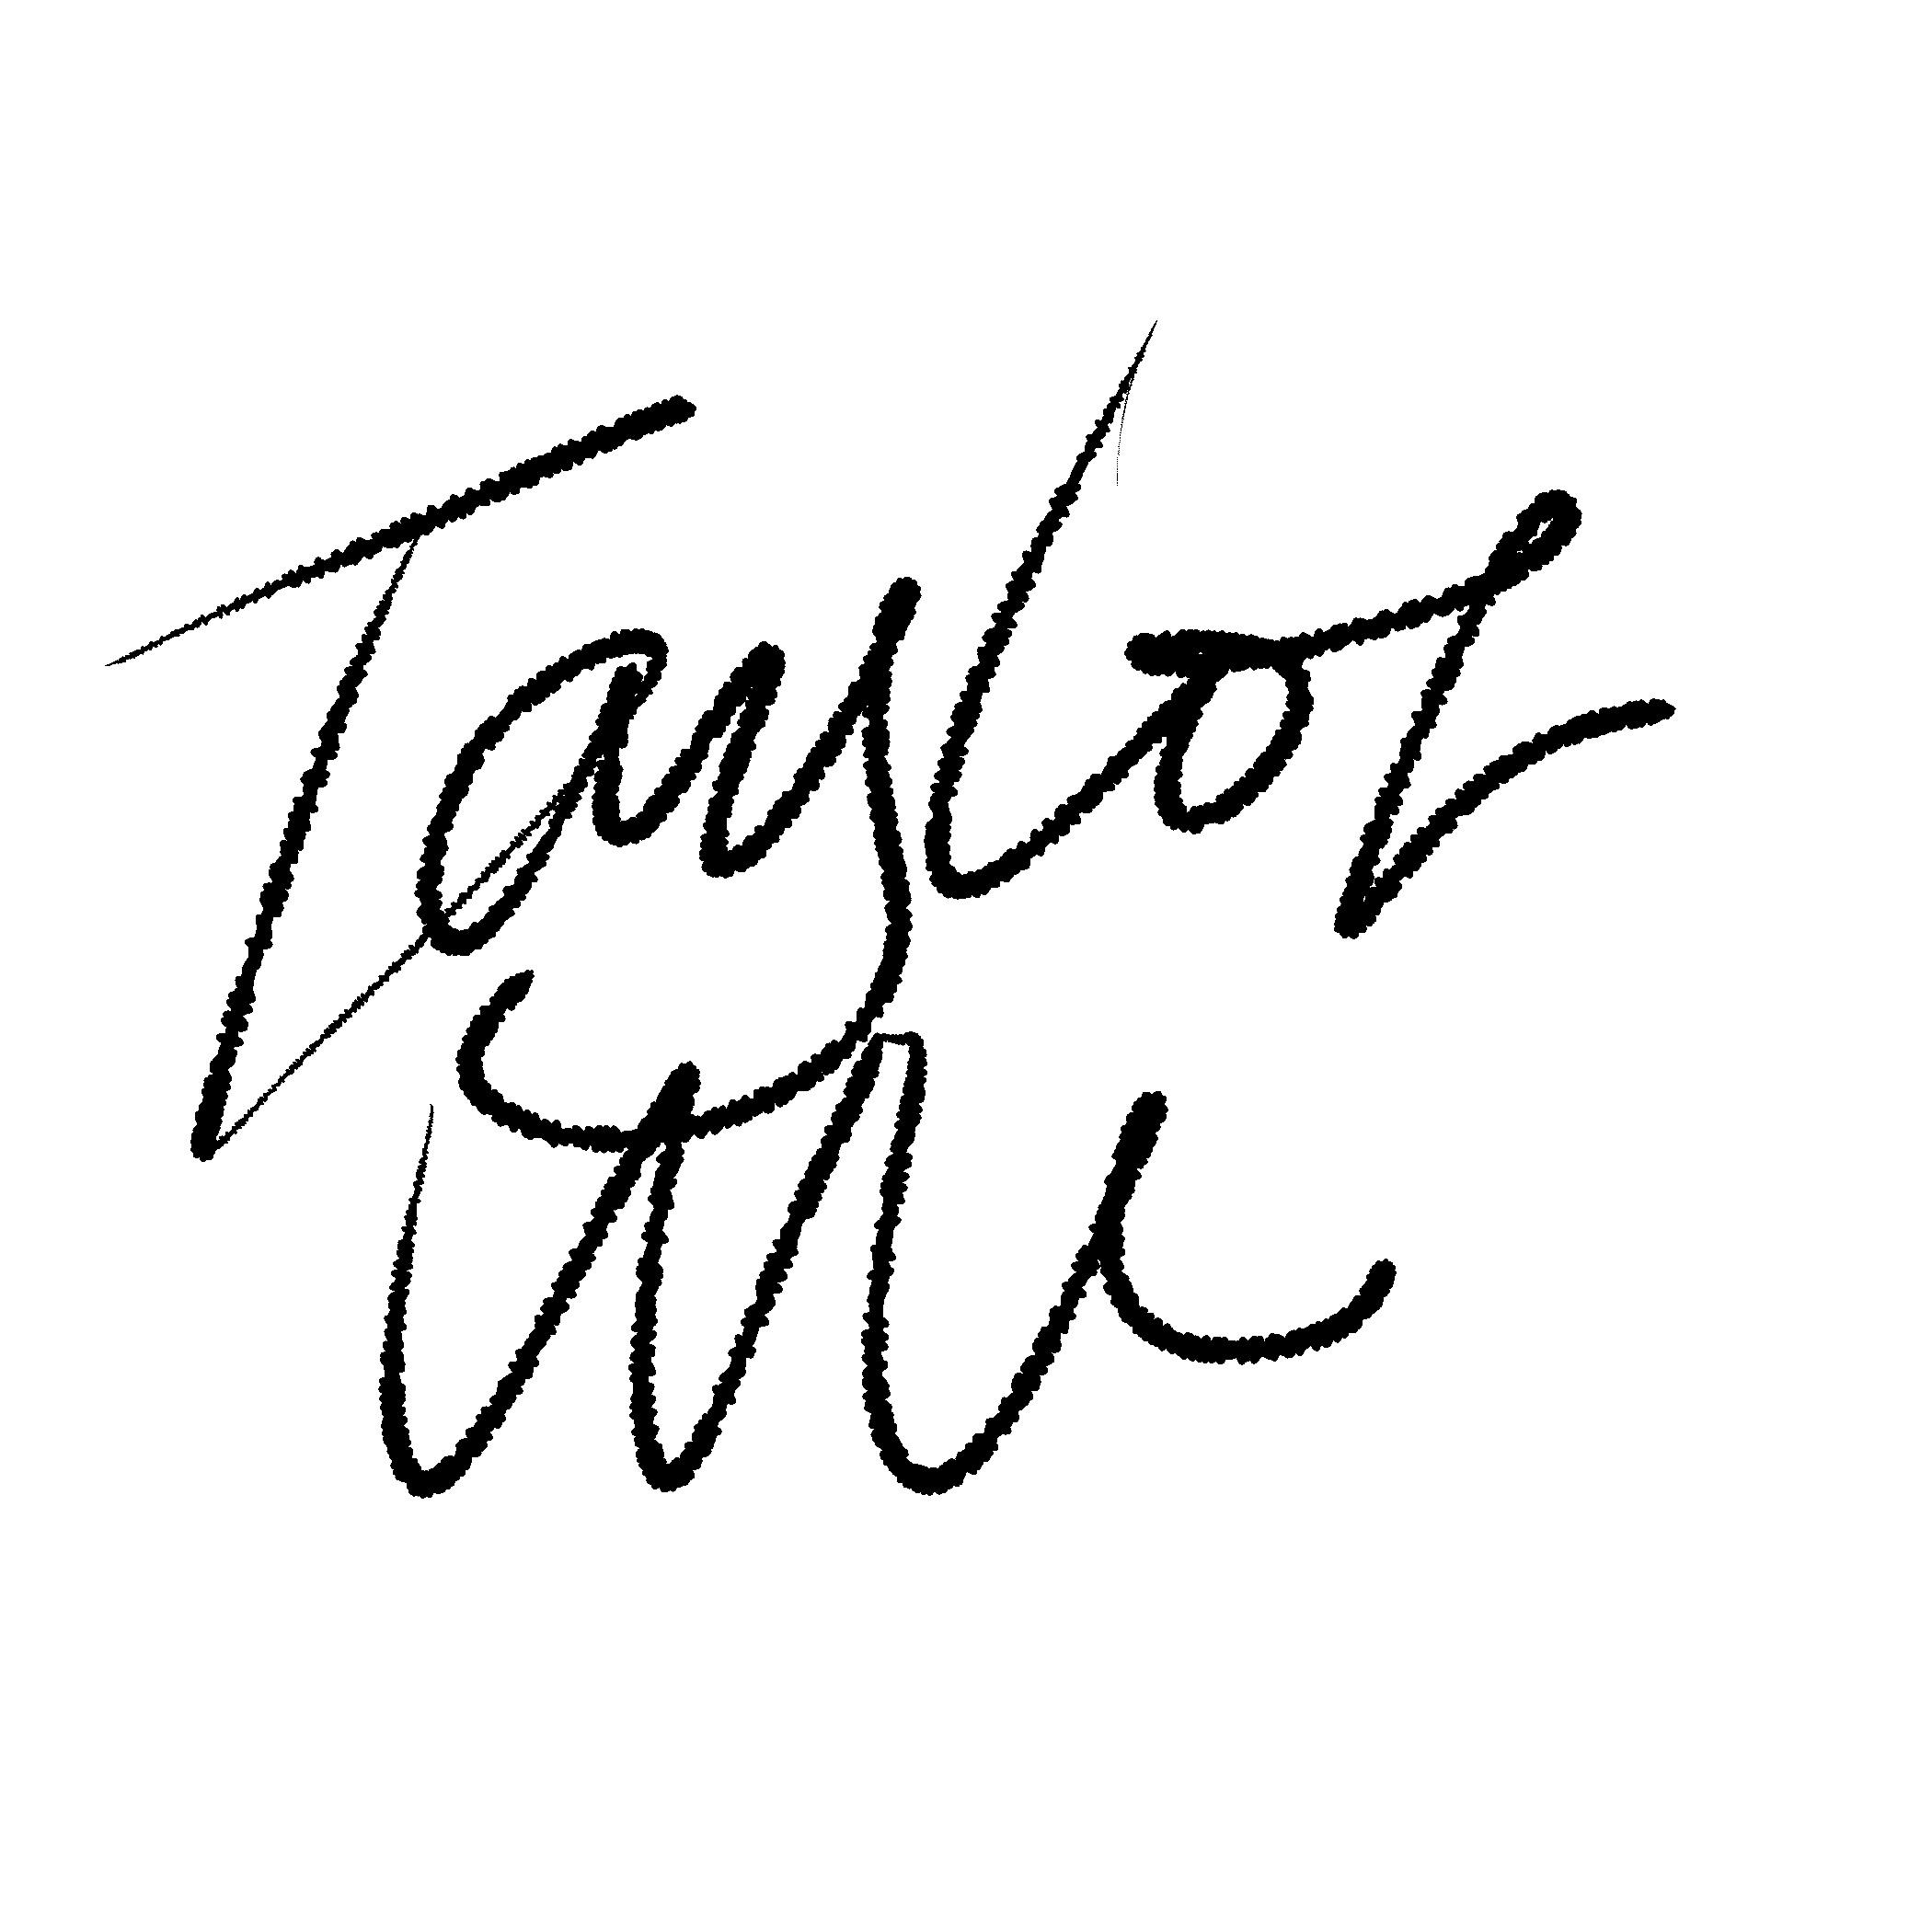 taylor wu Signature